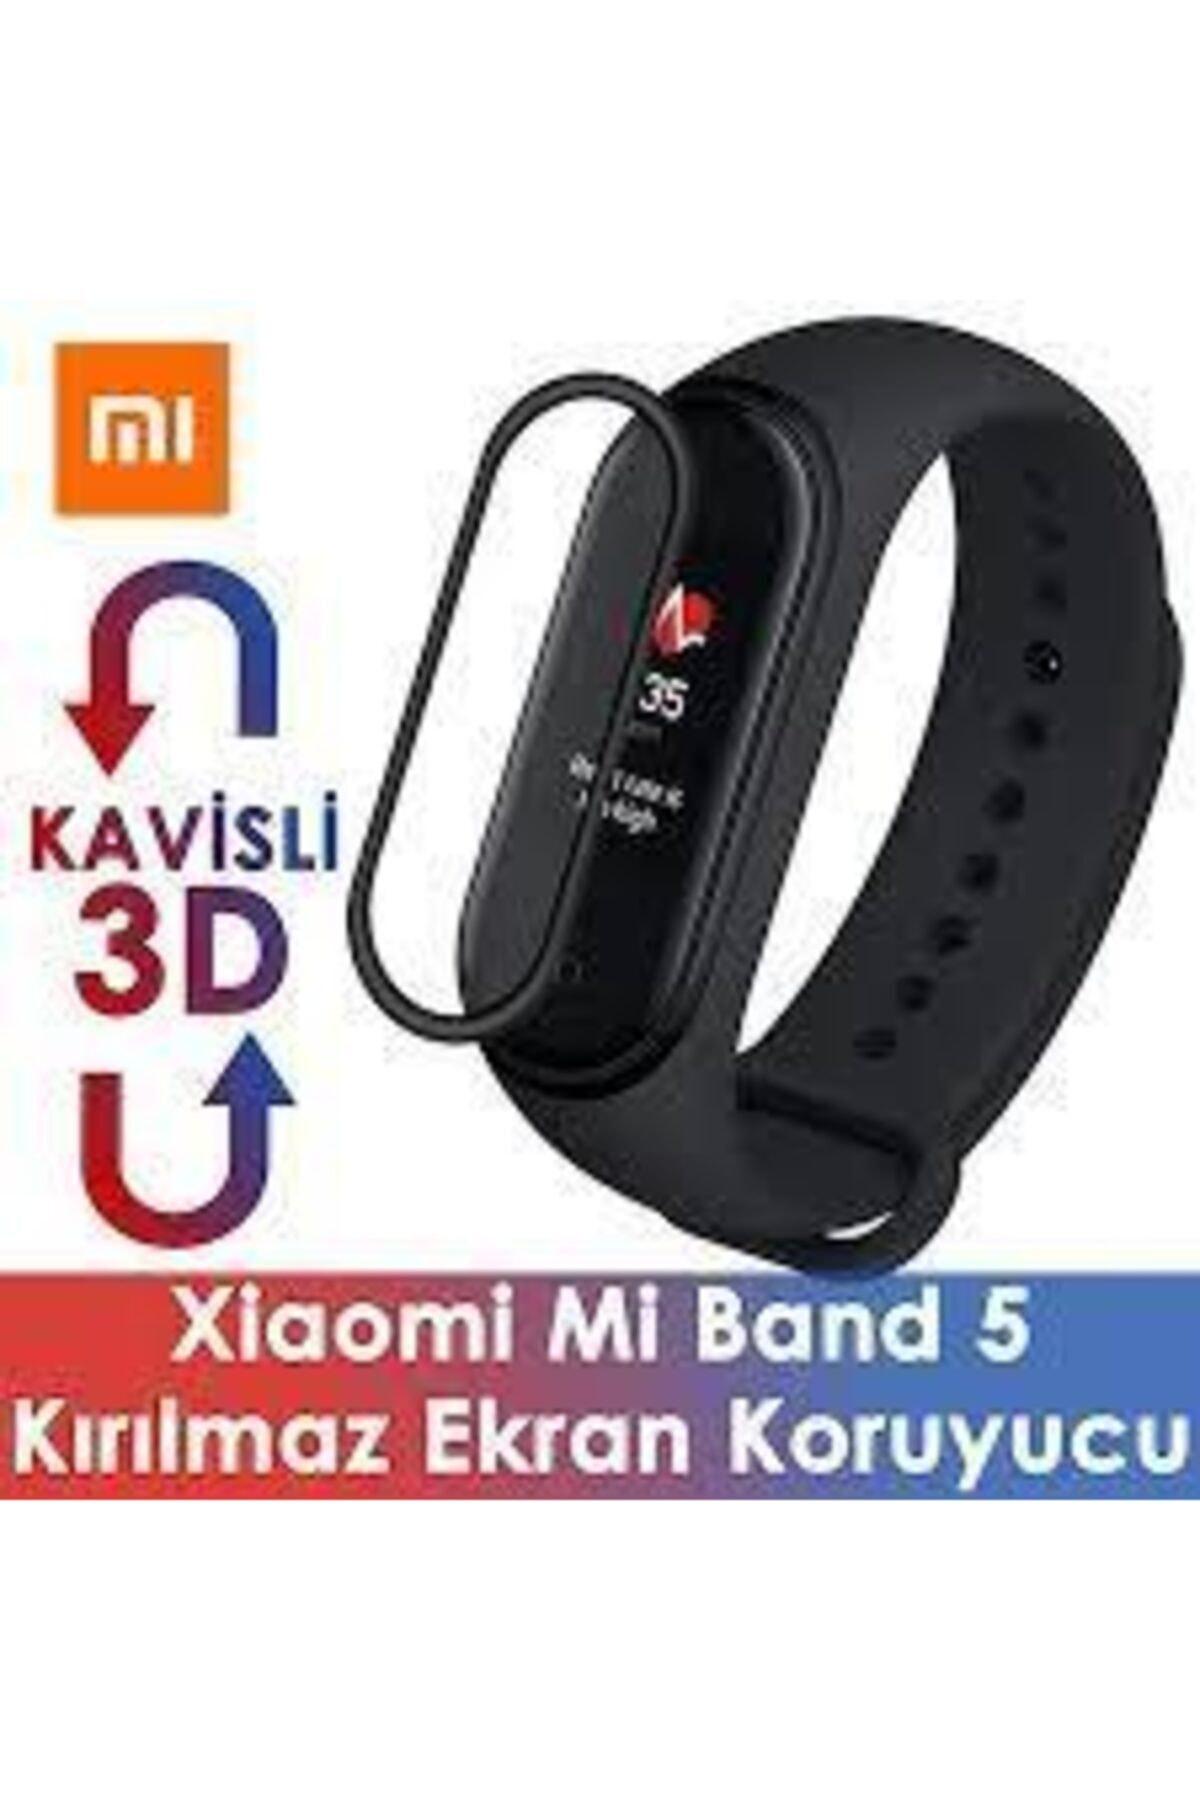 Xiaomi Mi Band 6-mi Bnad 5 3d Kavisli Full Kaplama Koruyucu